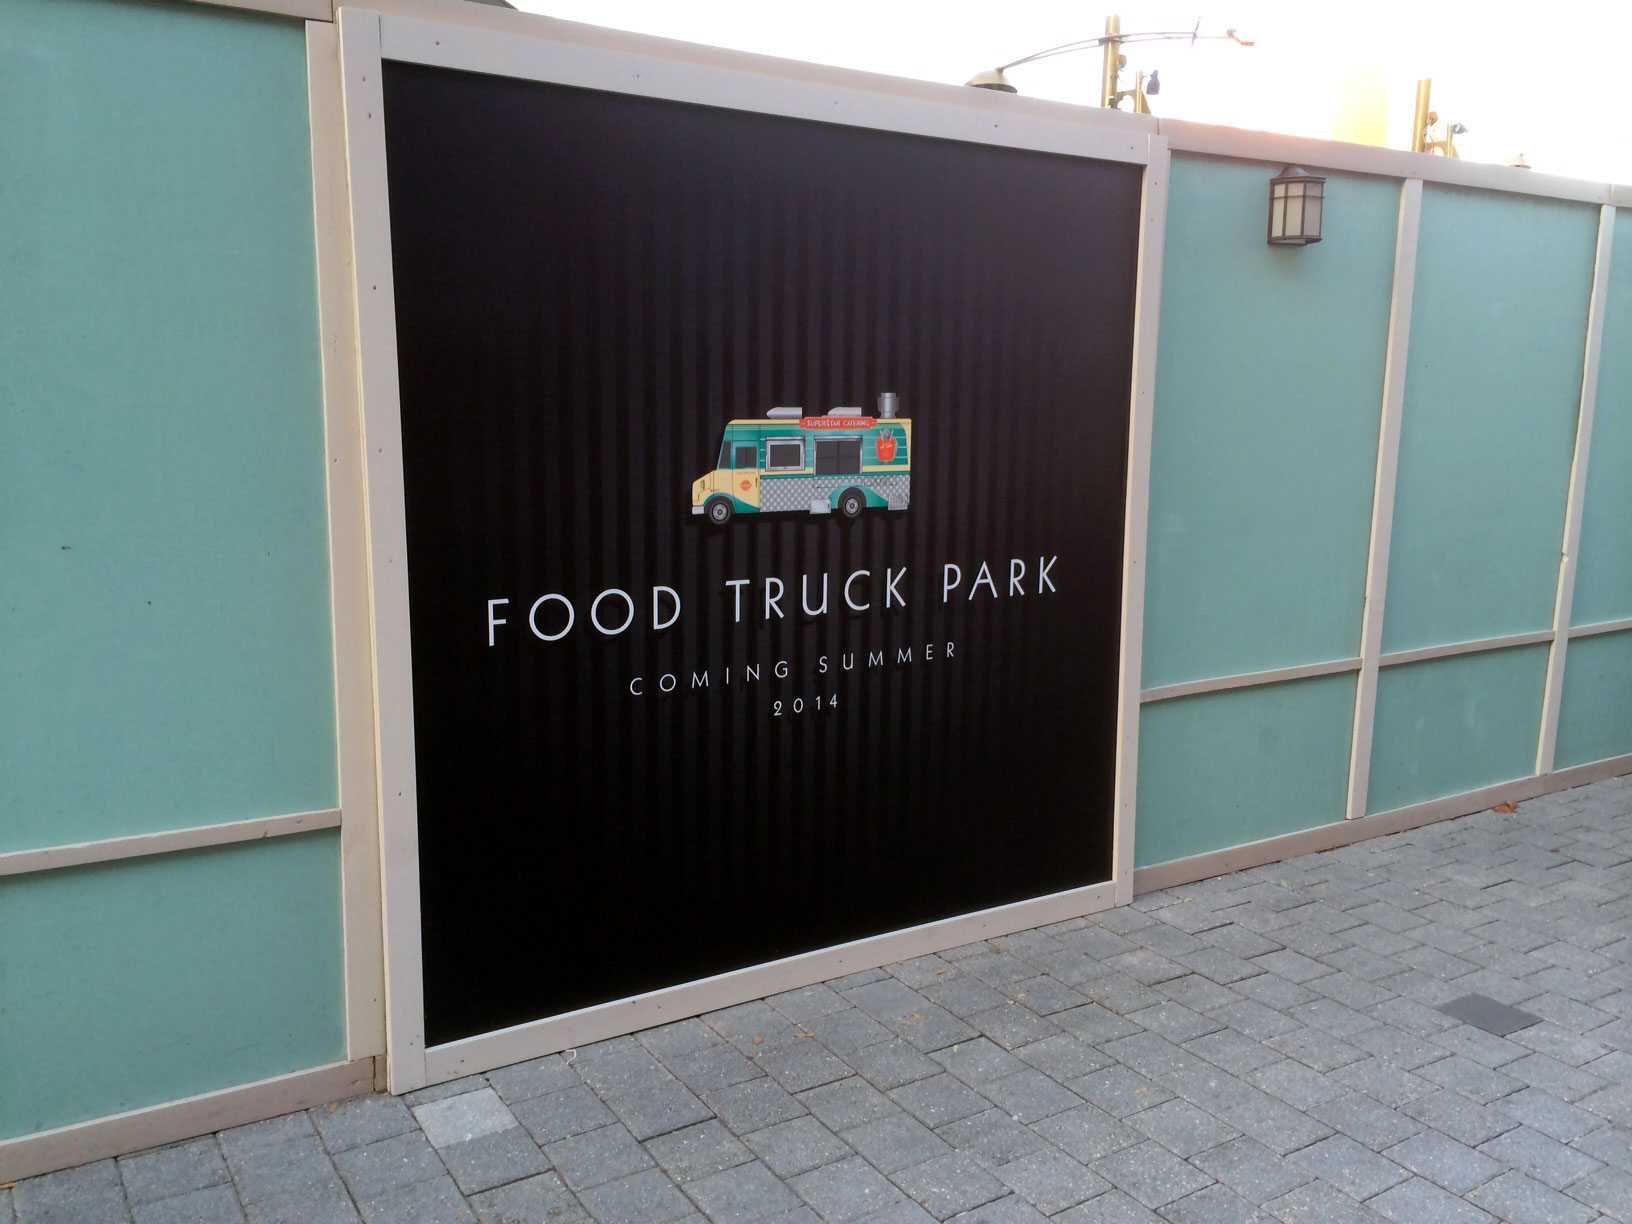 Food Truck Park signage